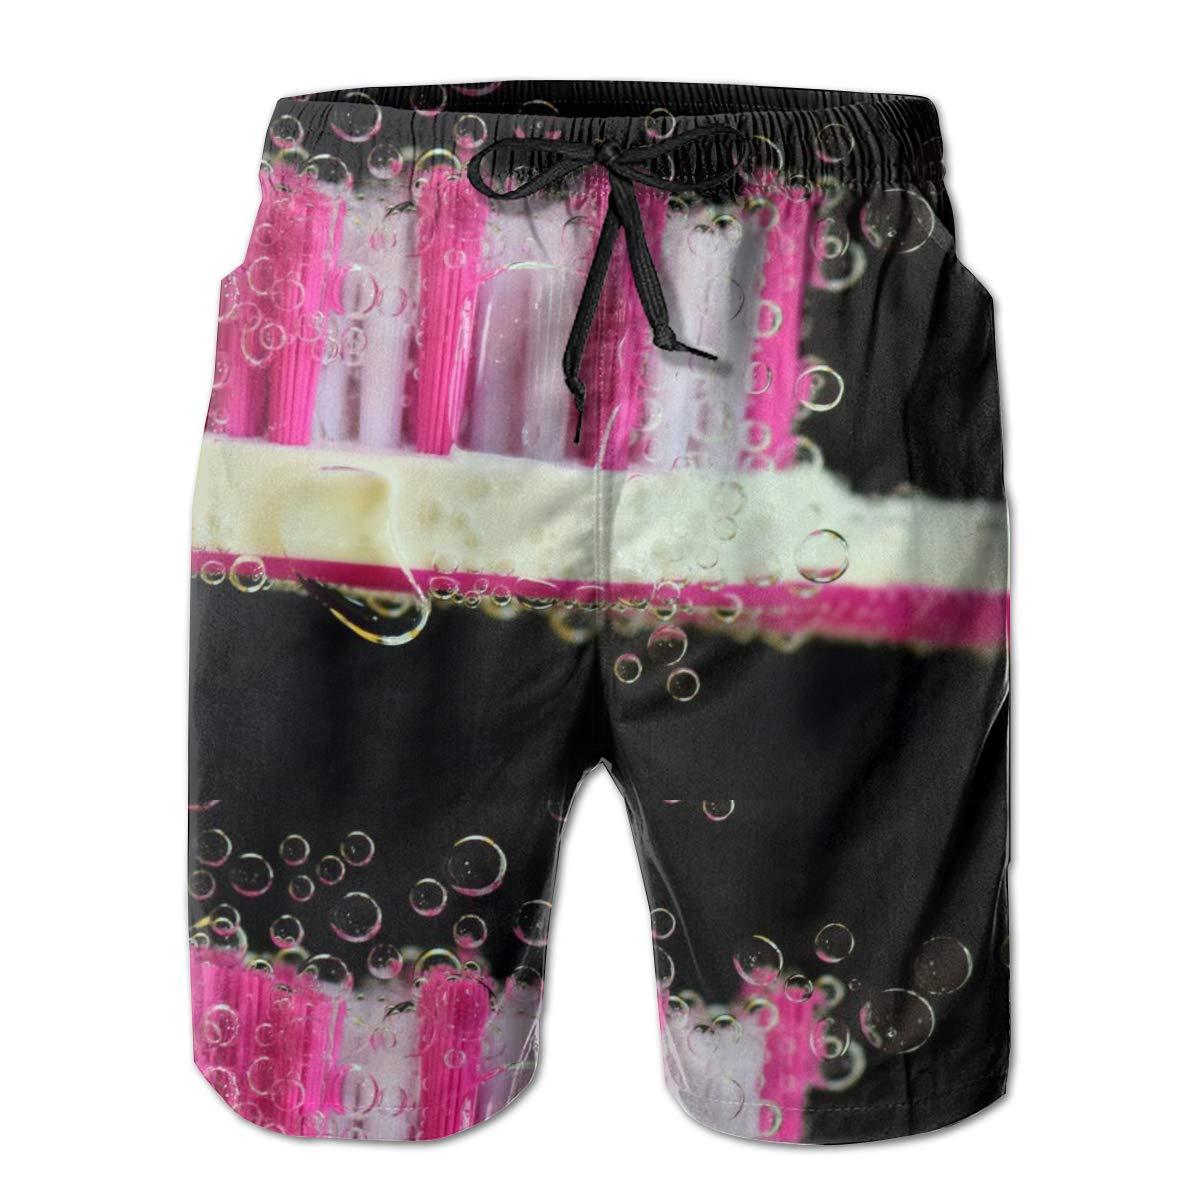 Jngjs Summer Holiday Beachwear with Mesh Lining Beach Pants